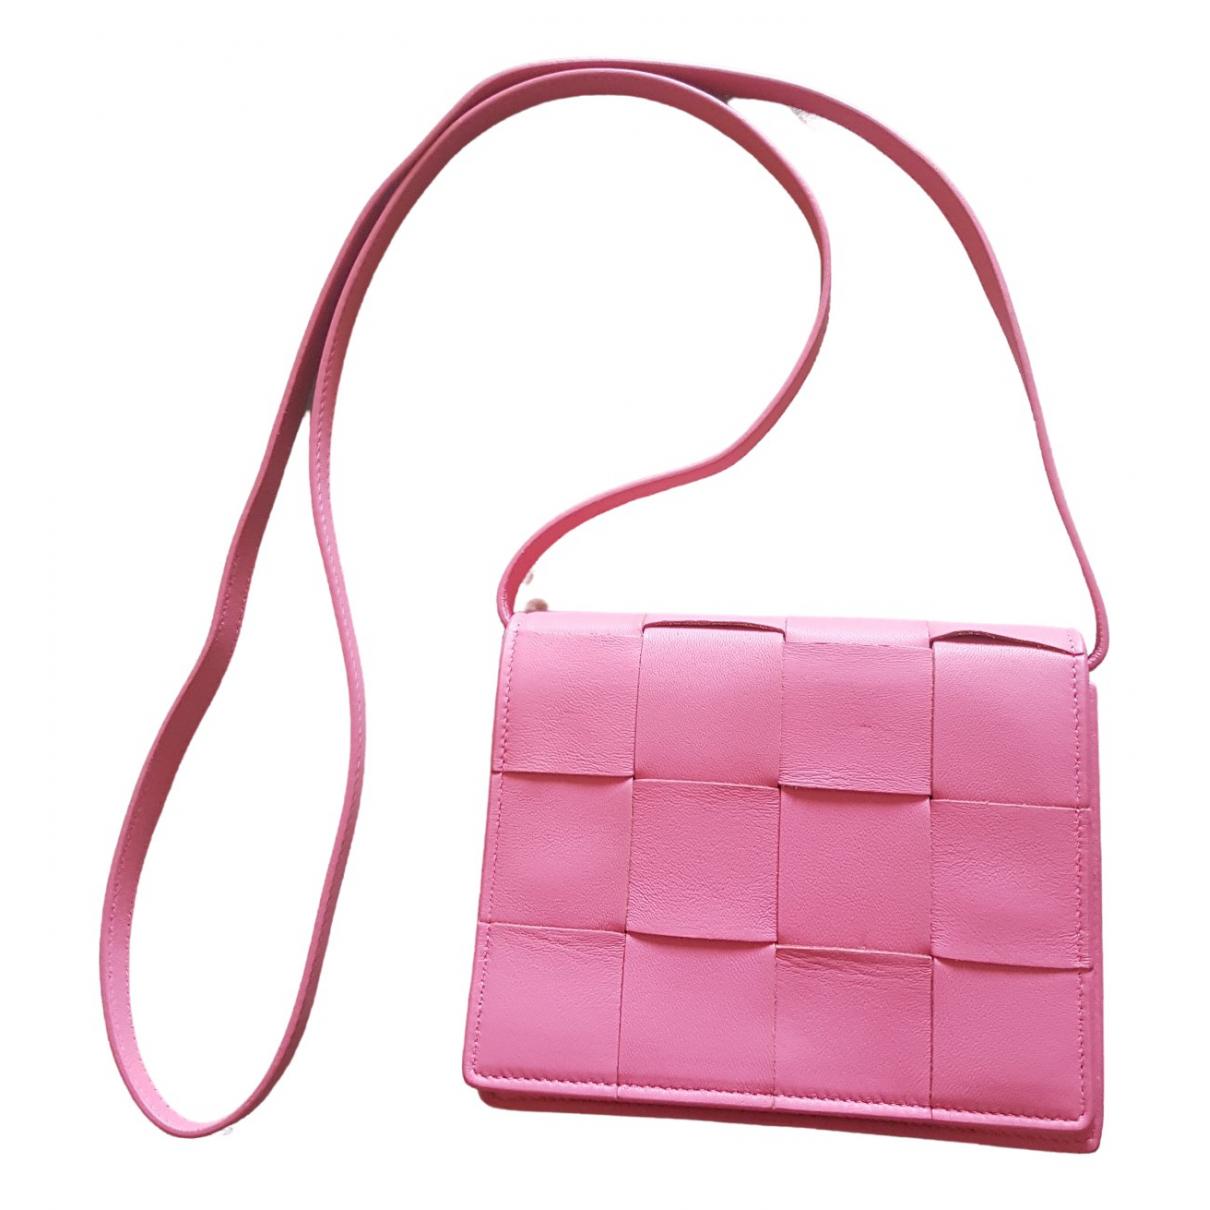 Bottega Veneta - Sac a main Cassette pour femme en cuir - rose